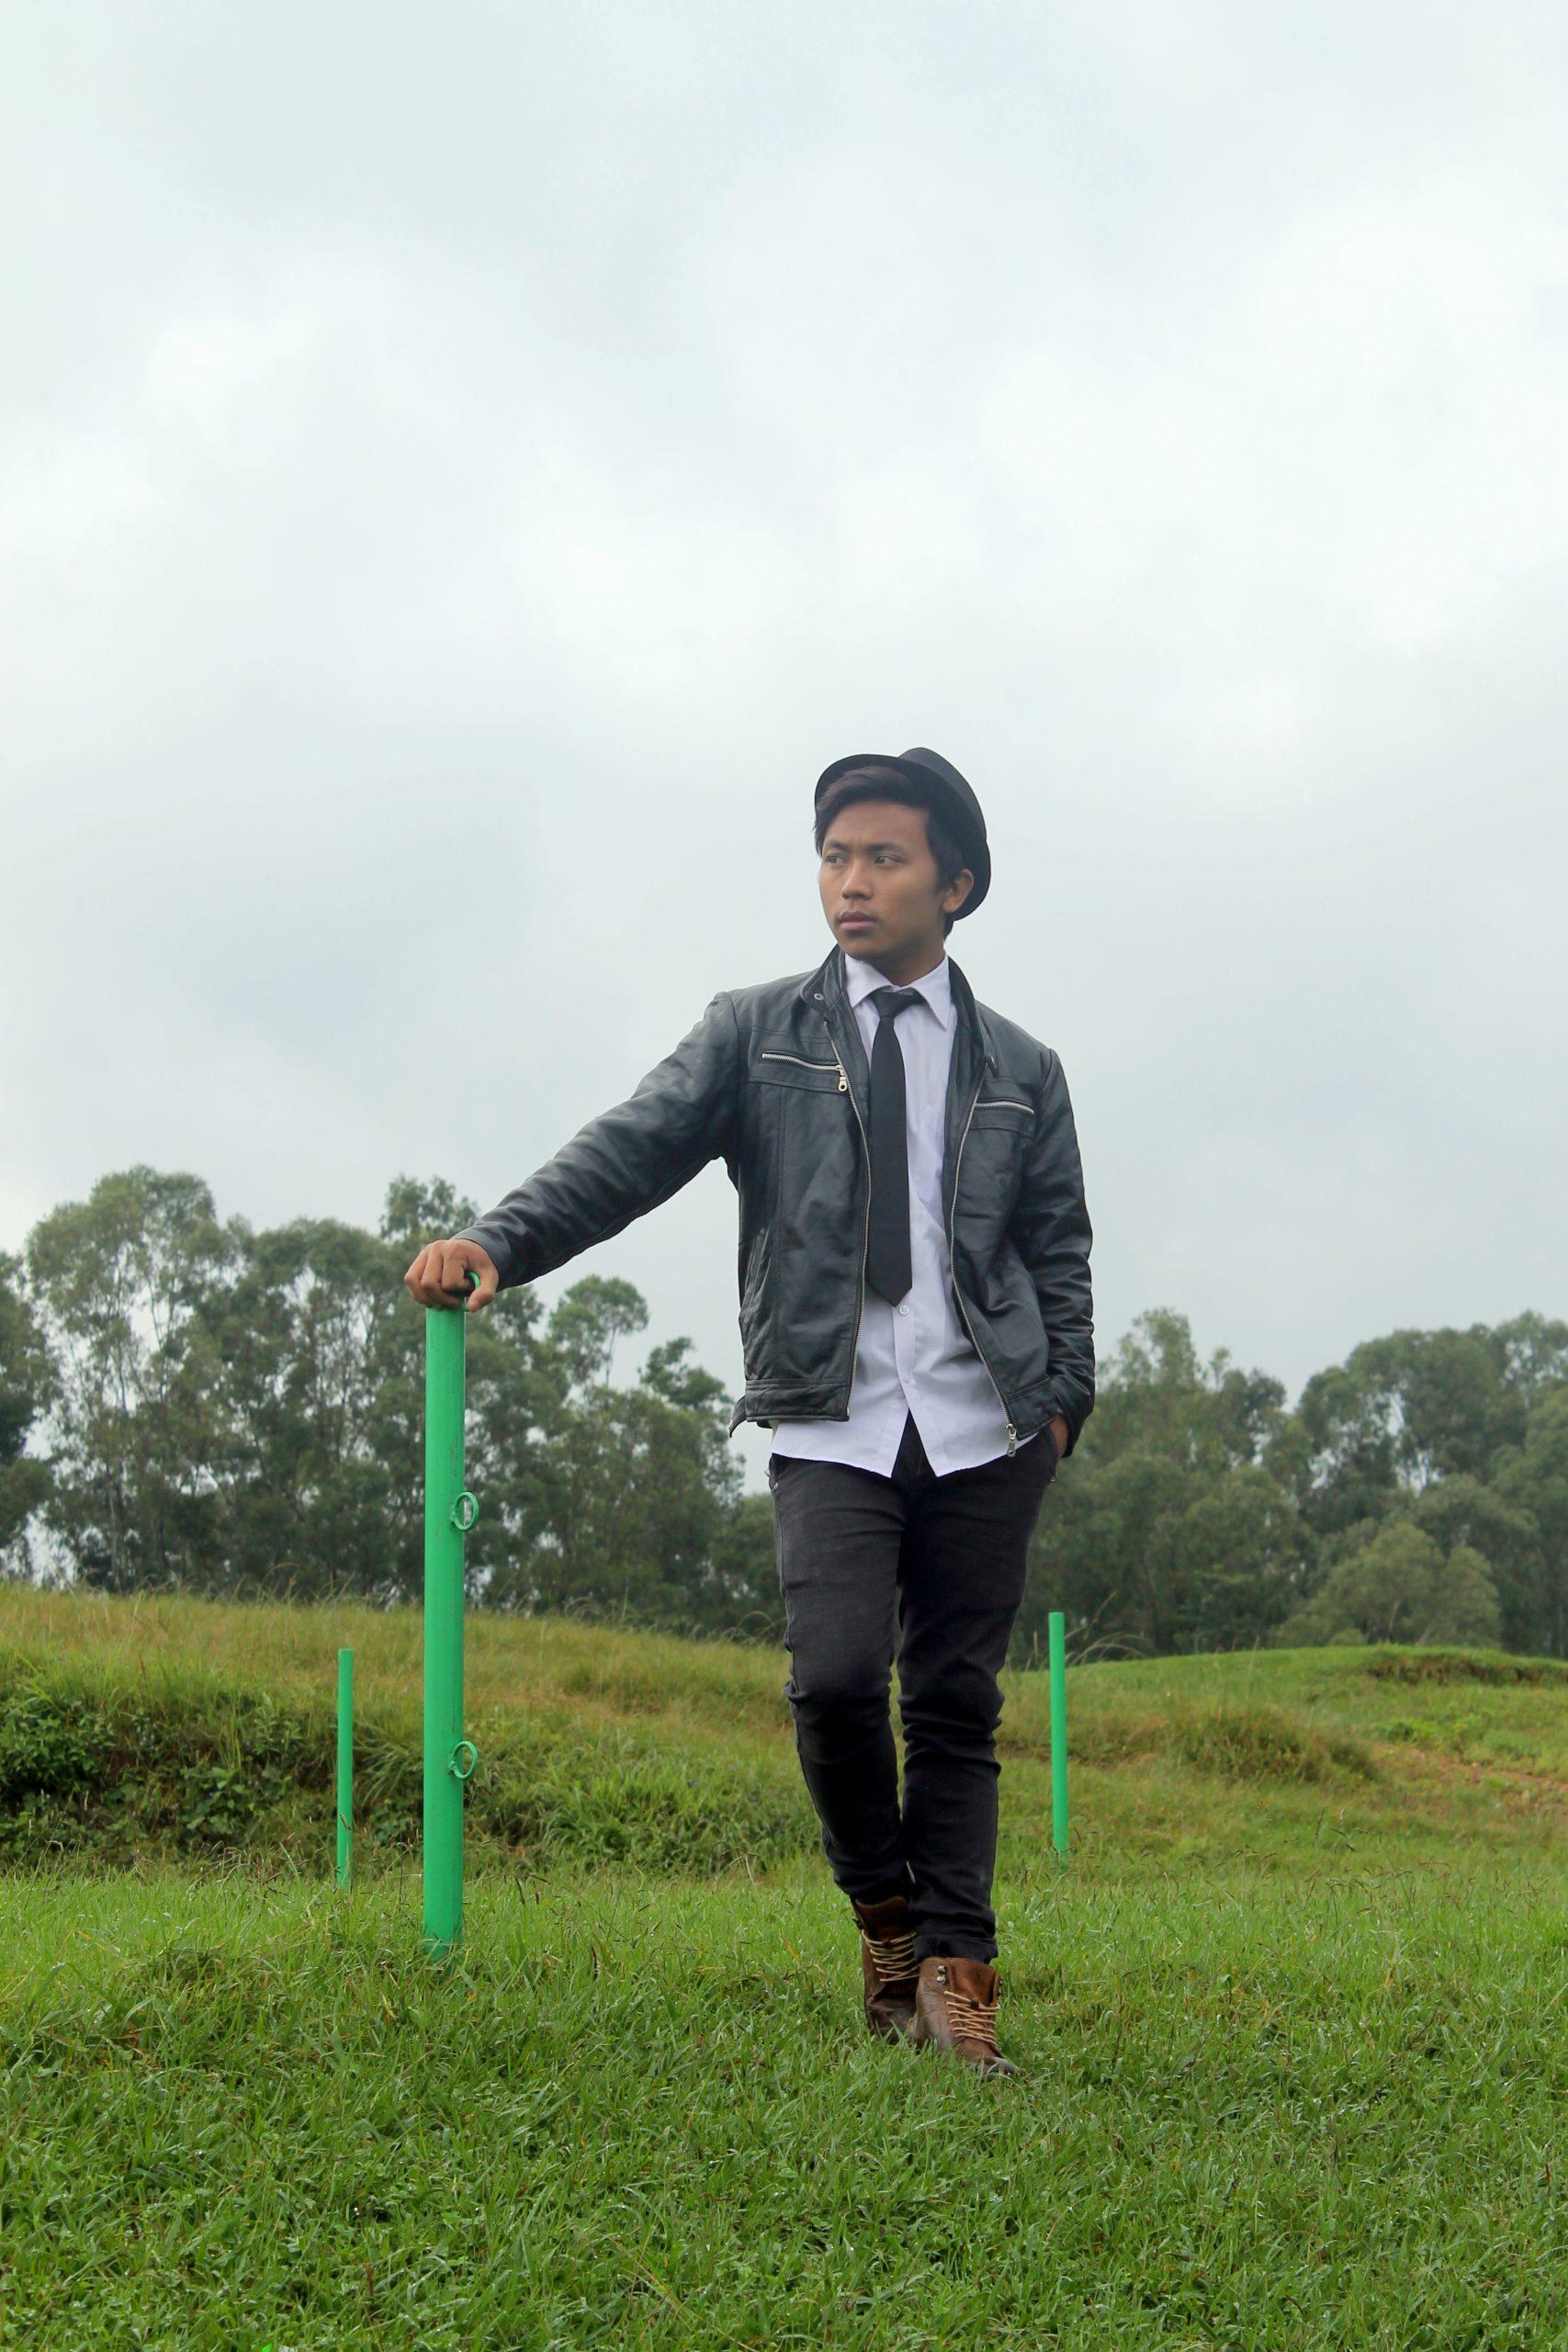 Boy posing in garden while holding pole